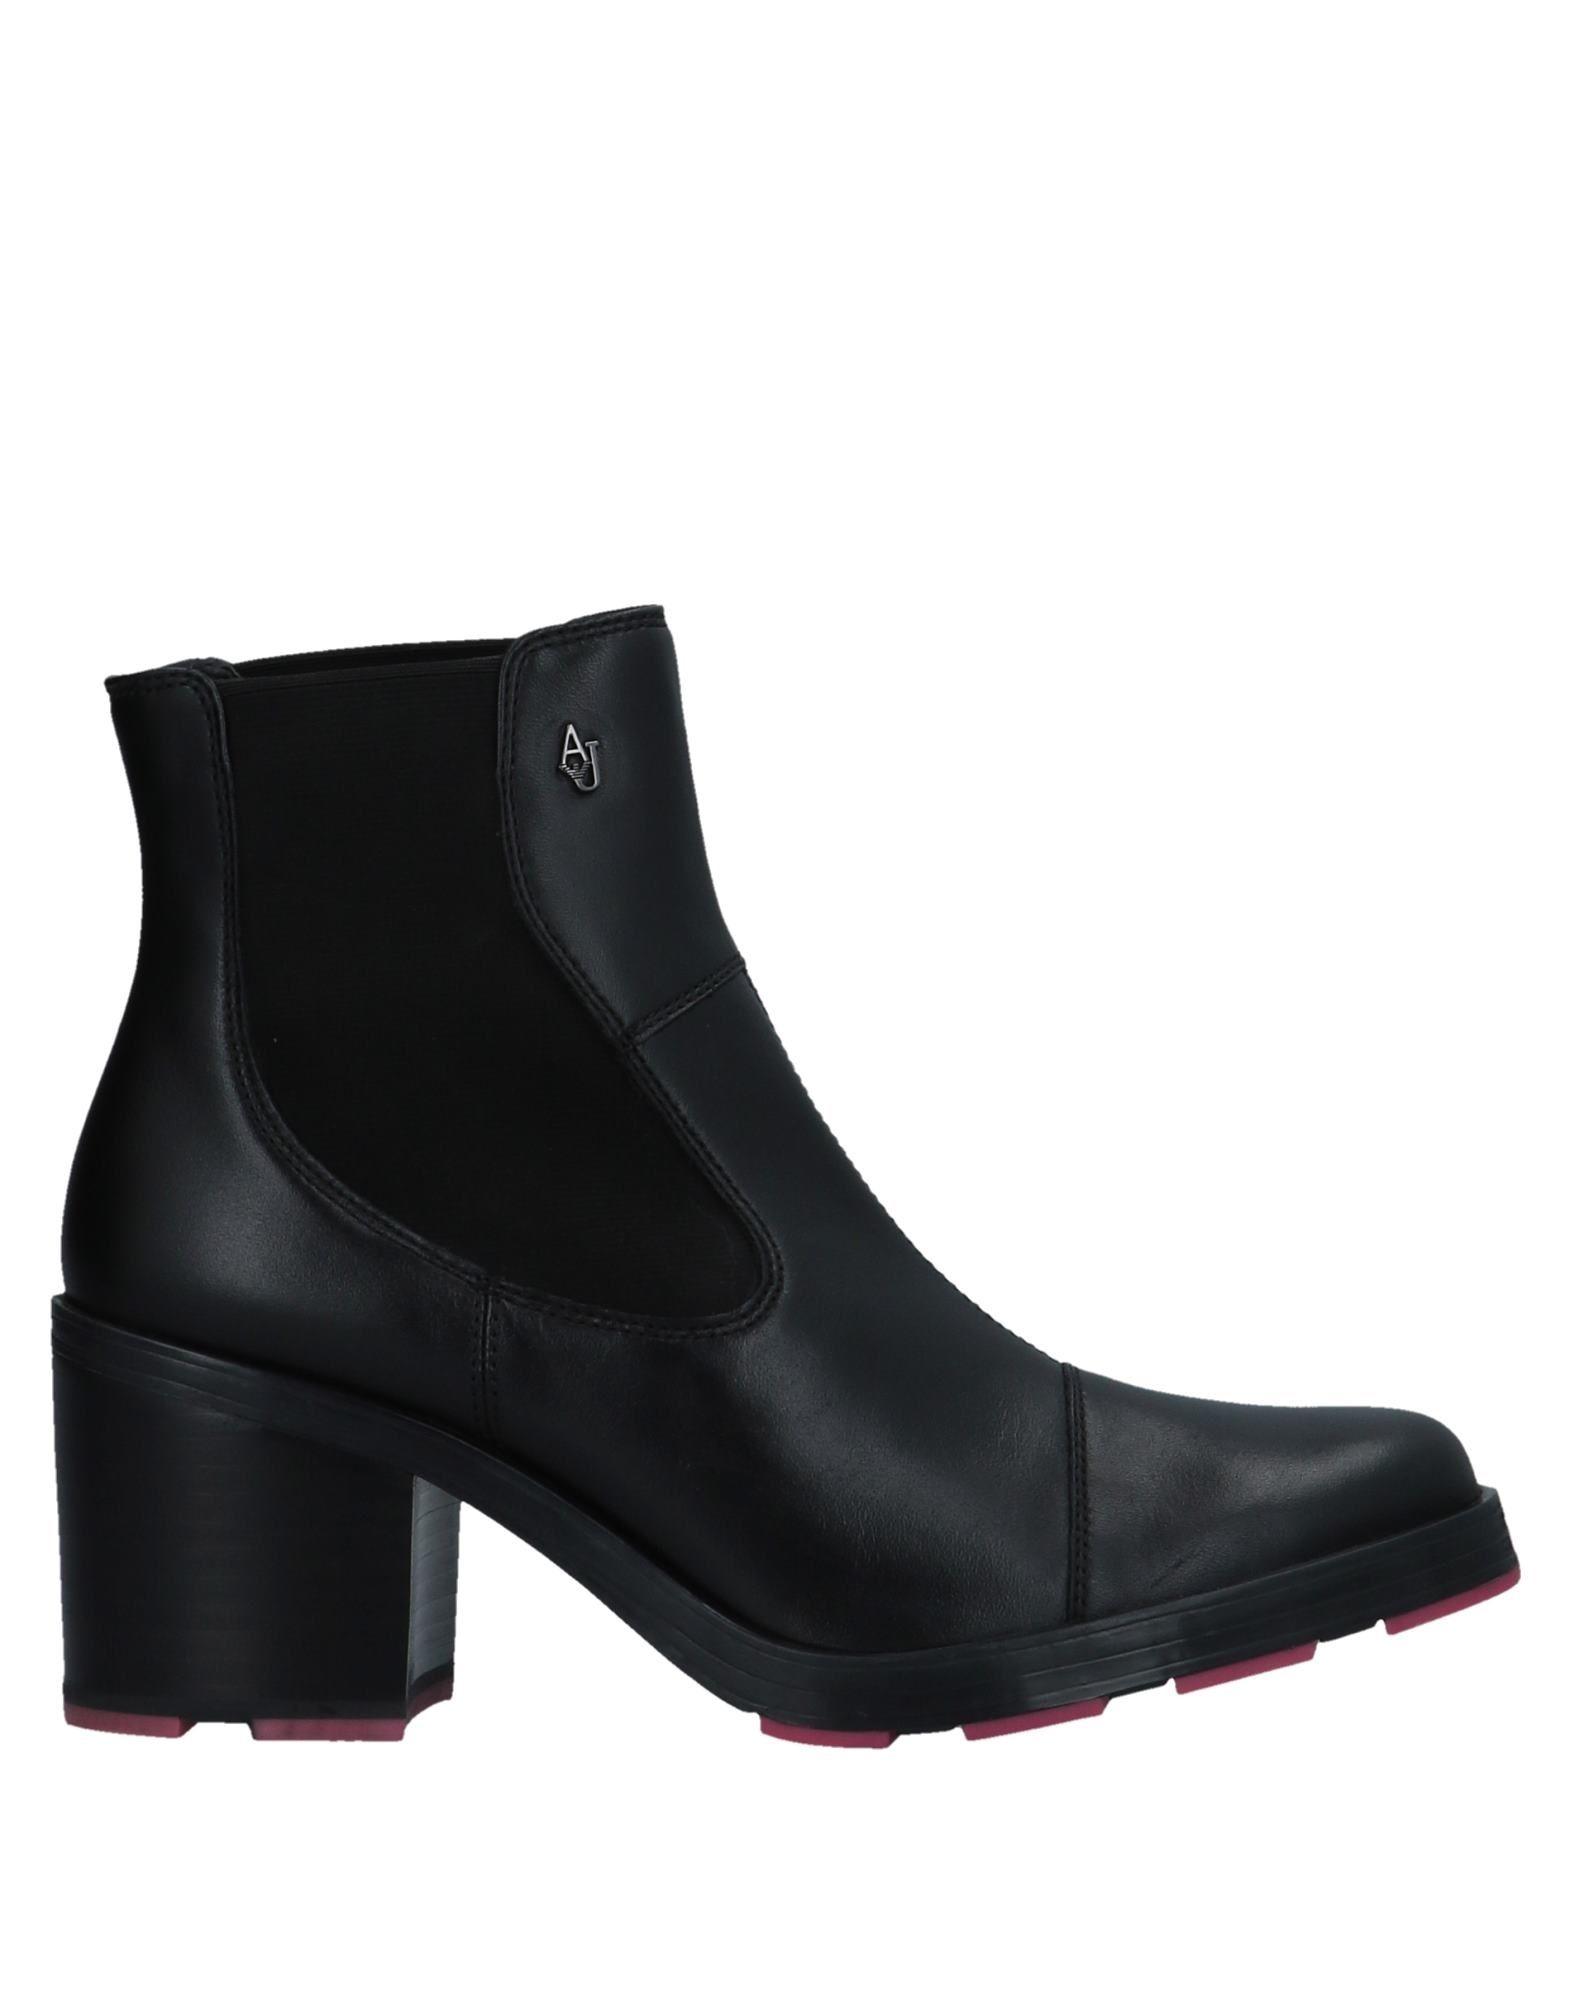 Stilvolle billige Schuhe Armani  Jeans Chelsea Boots Damen  Armani 11537741MO 84d8f1